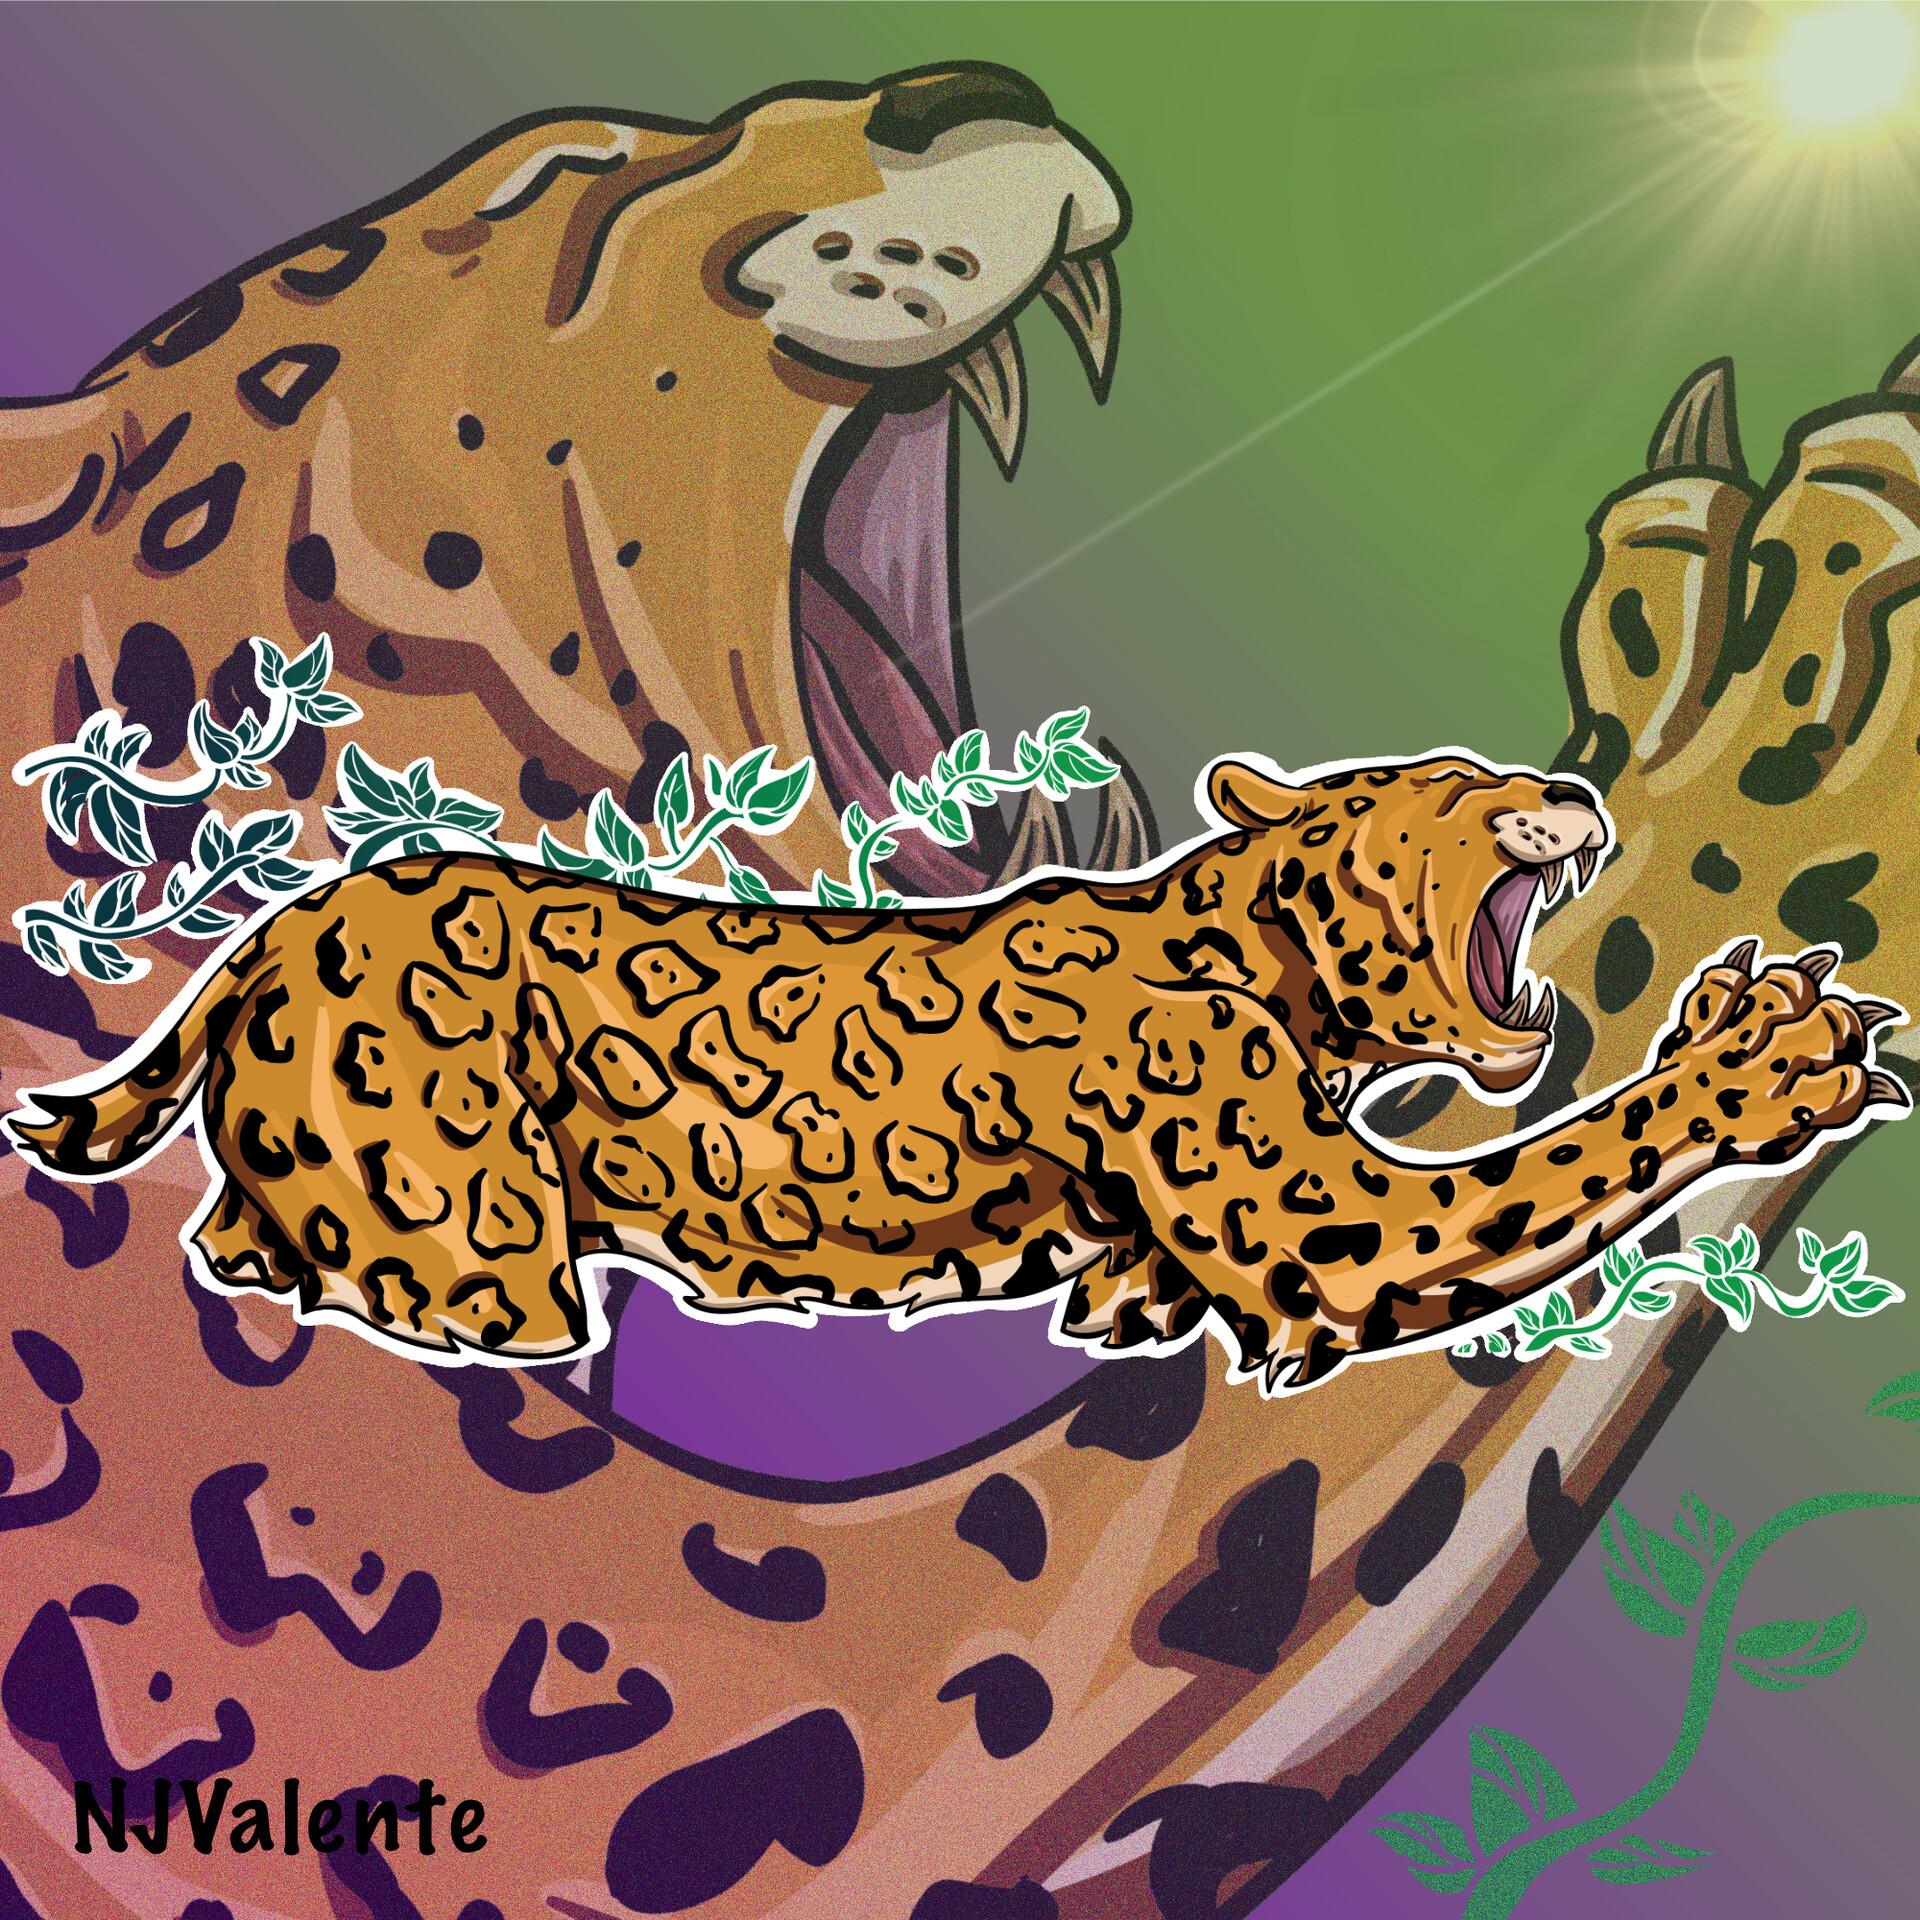 Nick valente jaguar